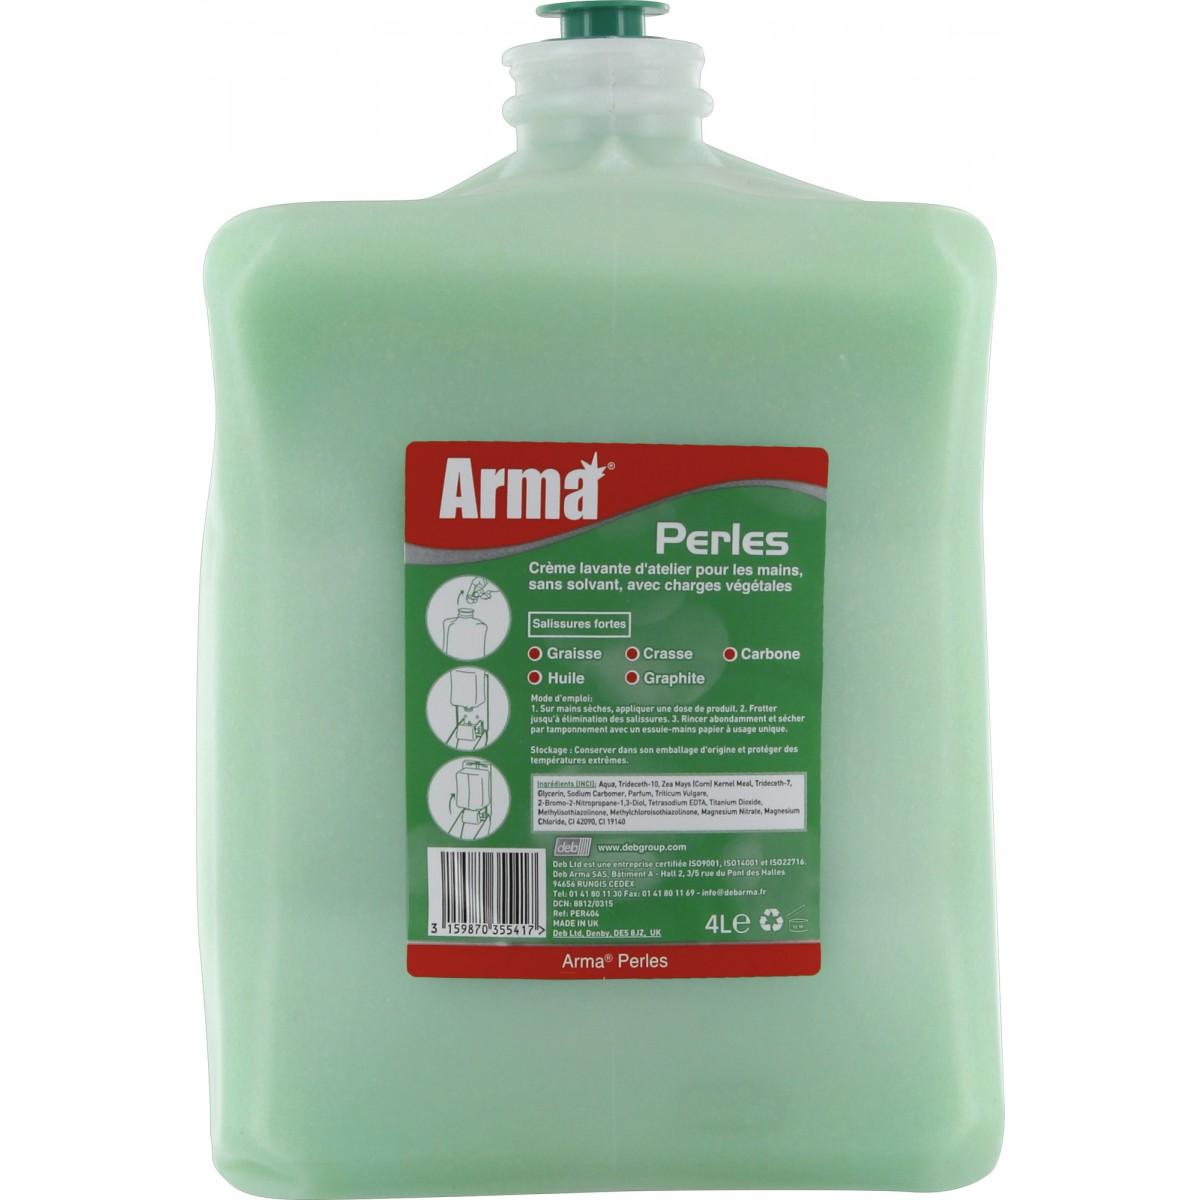 Savon perles recharge Arma - Pour appareil 85400 - 4 l